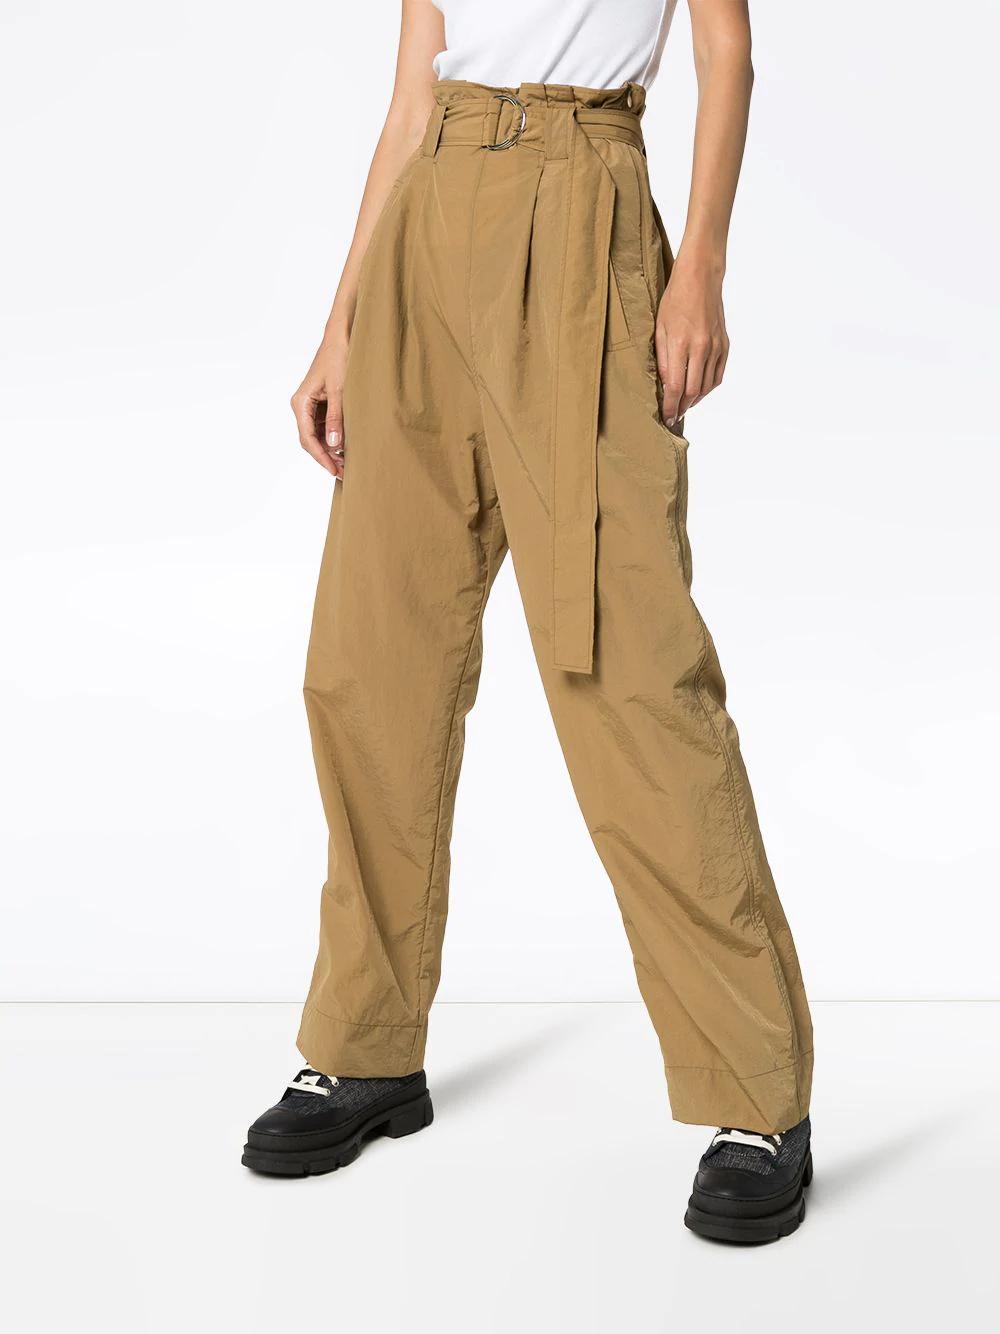 Ganni Pantalones De Tiro Alto Con Cinturon Farfetch Pantalon Tiro Alto Vintage Ropa Hombre Pantalones